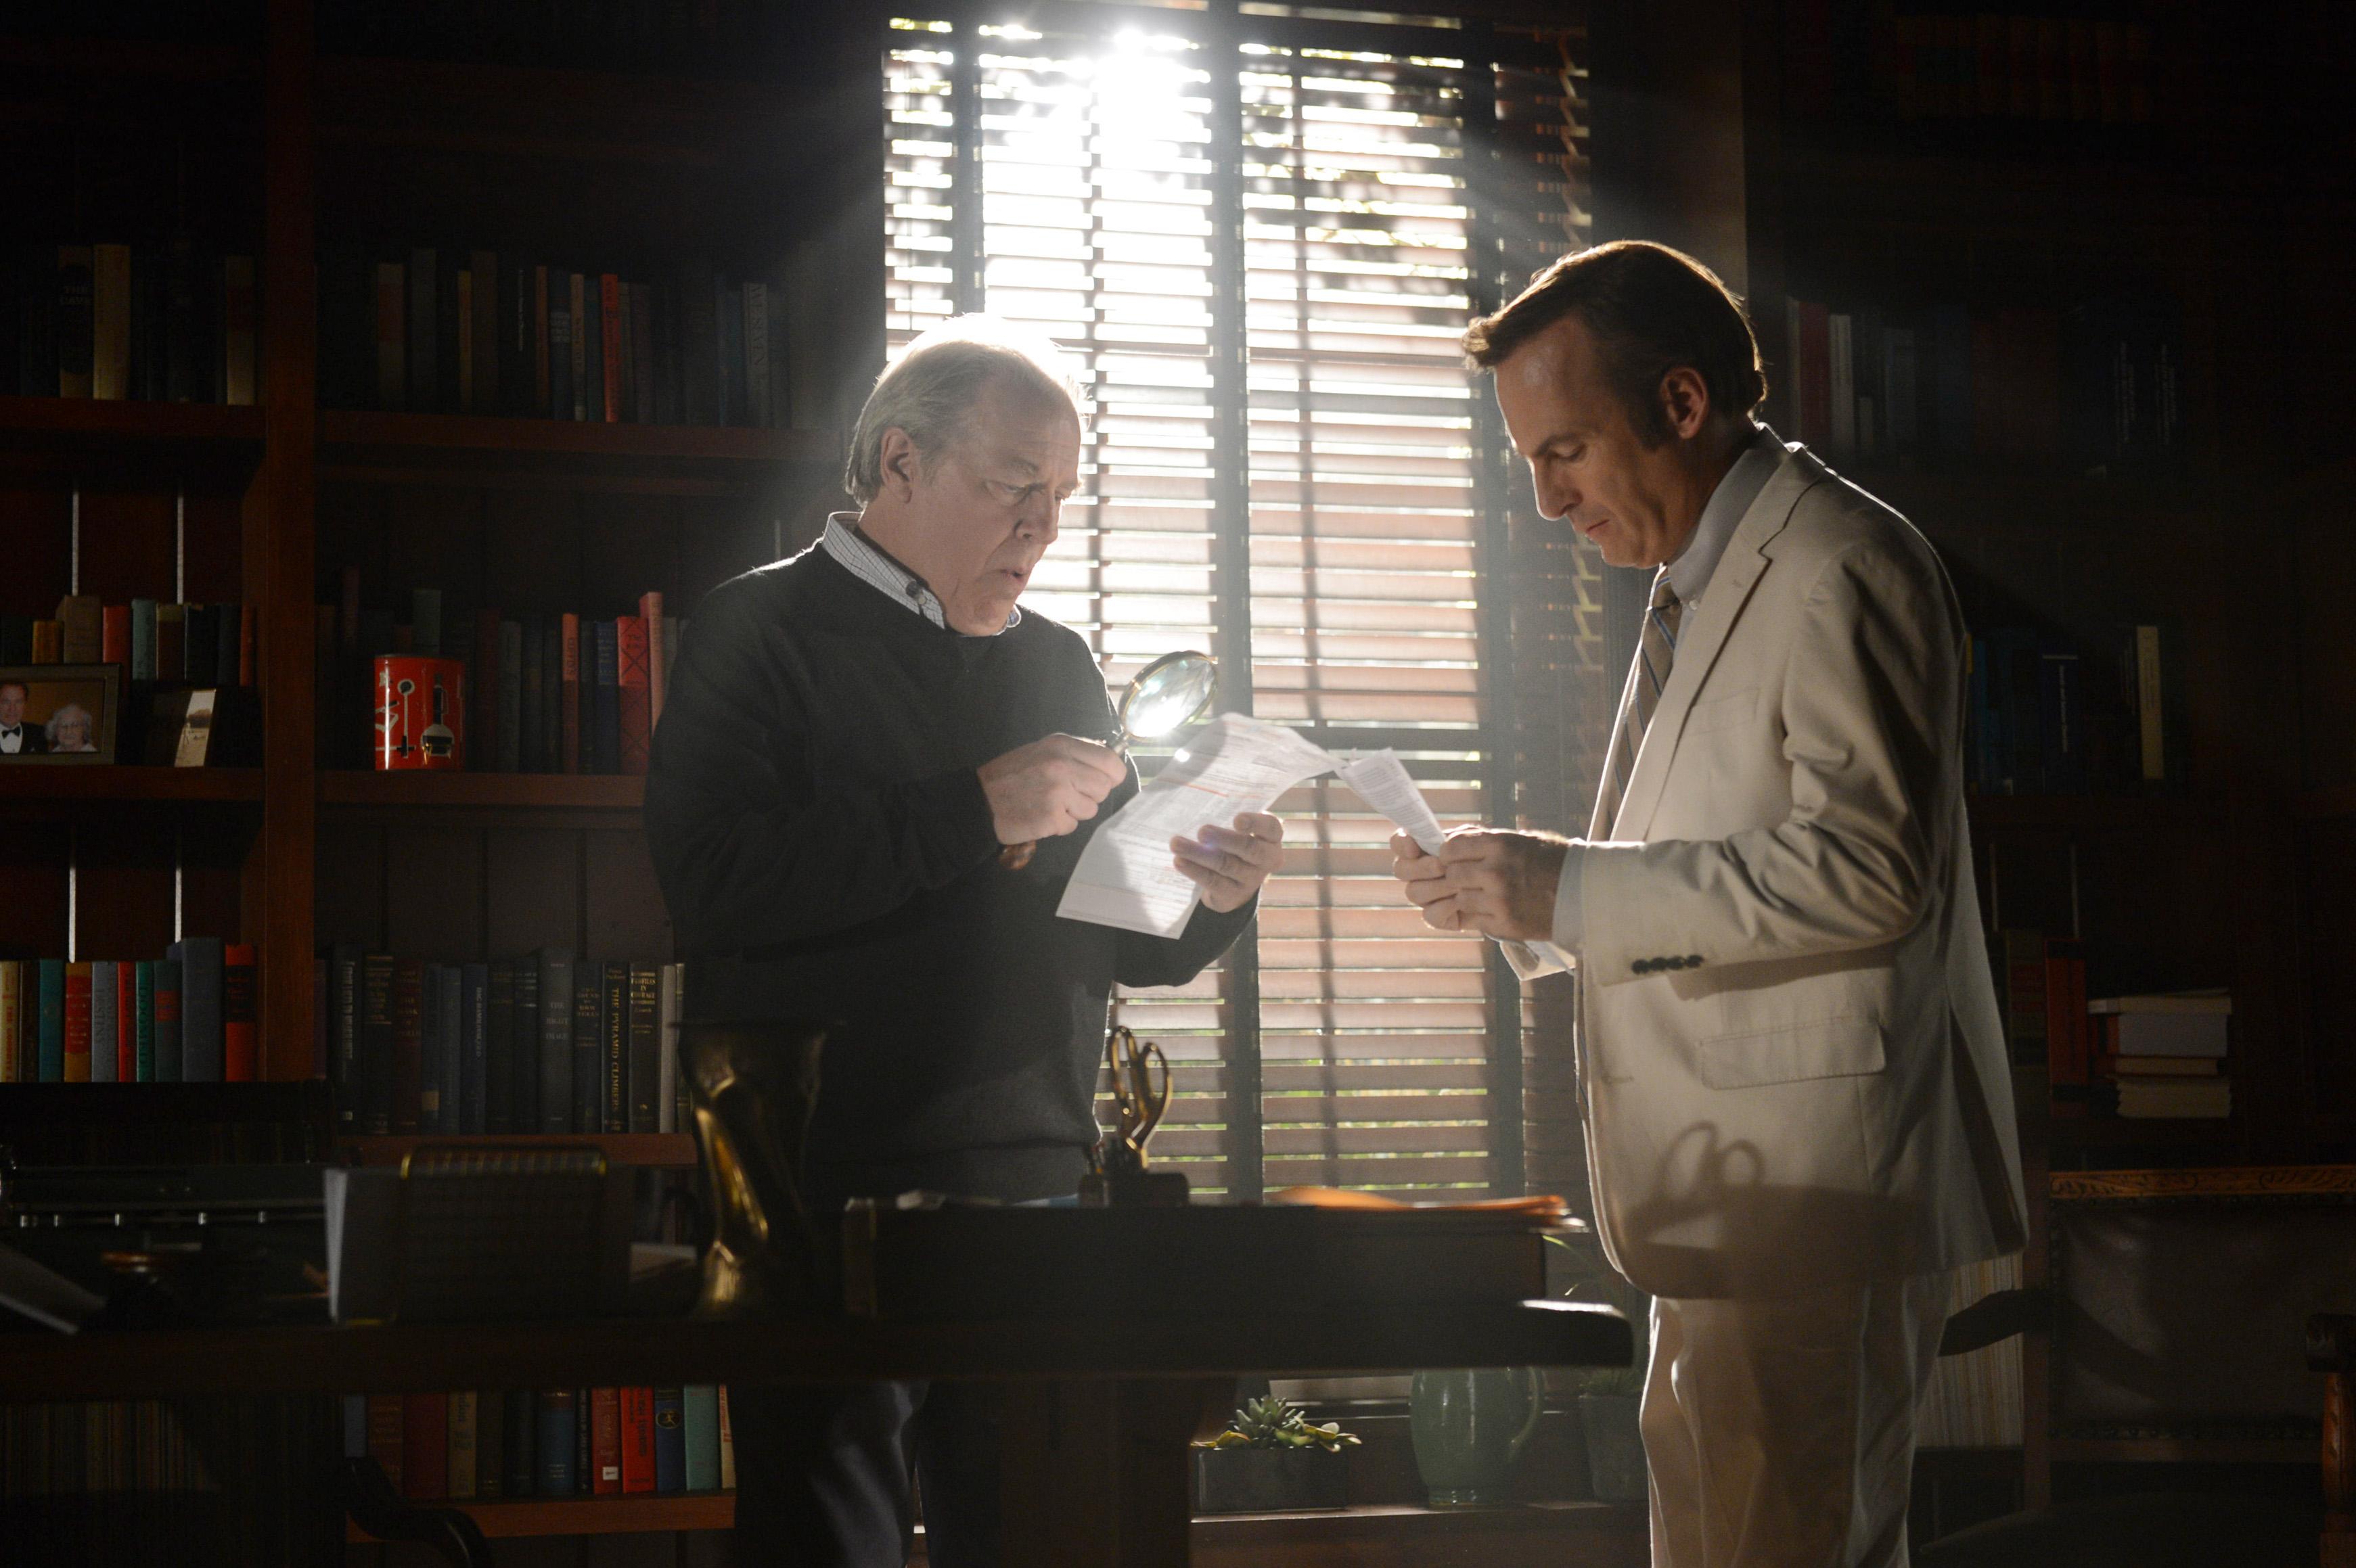 'Better Call Saul' Recap: Family Business